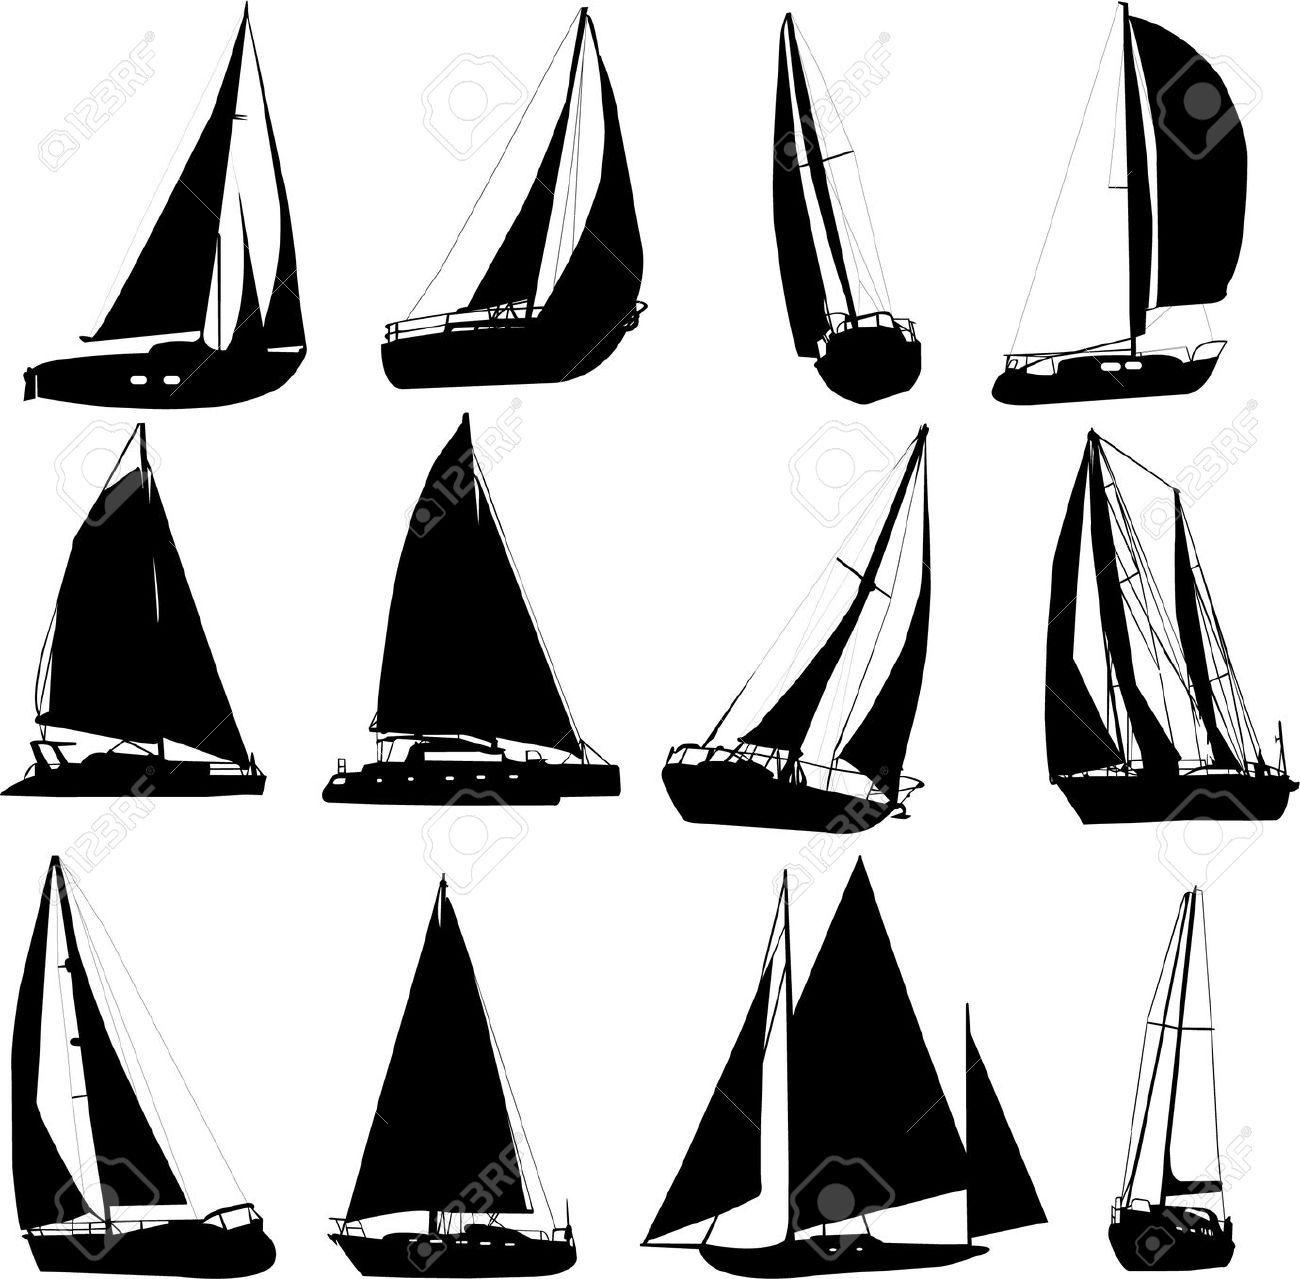 5535783-sailing-boat-silhouettes-vector-stock-vector-boat-sailboat